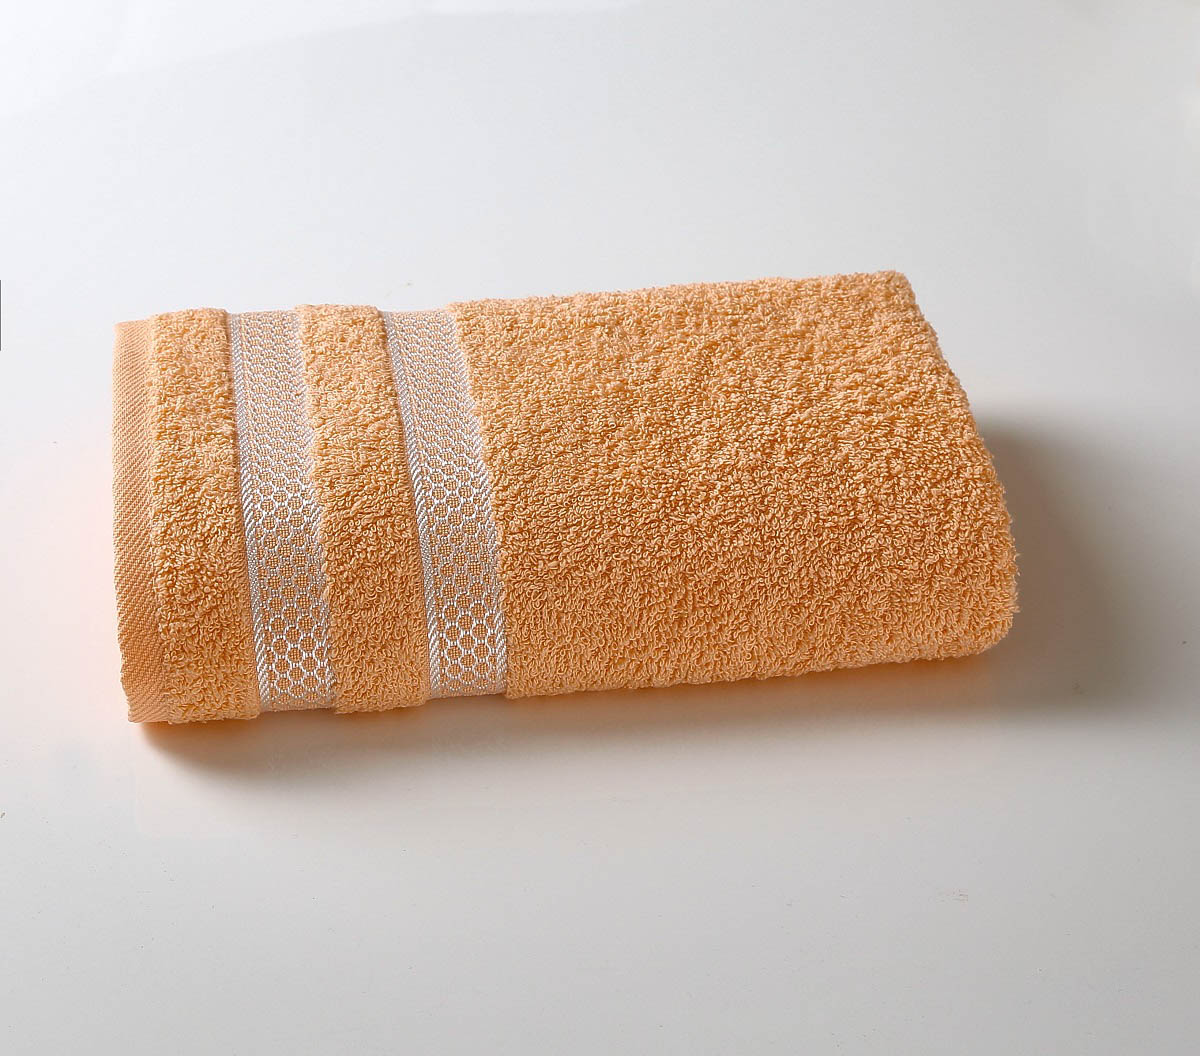 Полотенца Karna Полотенце Petek Цвет: Абрикосовый (70х140 см) полотенца karna полотенце iteka цвет коричневый 70х140 см